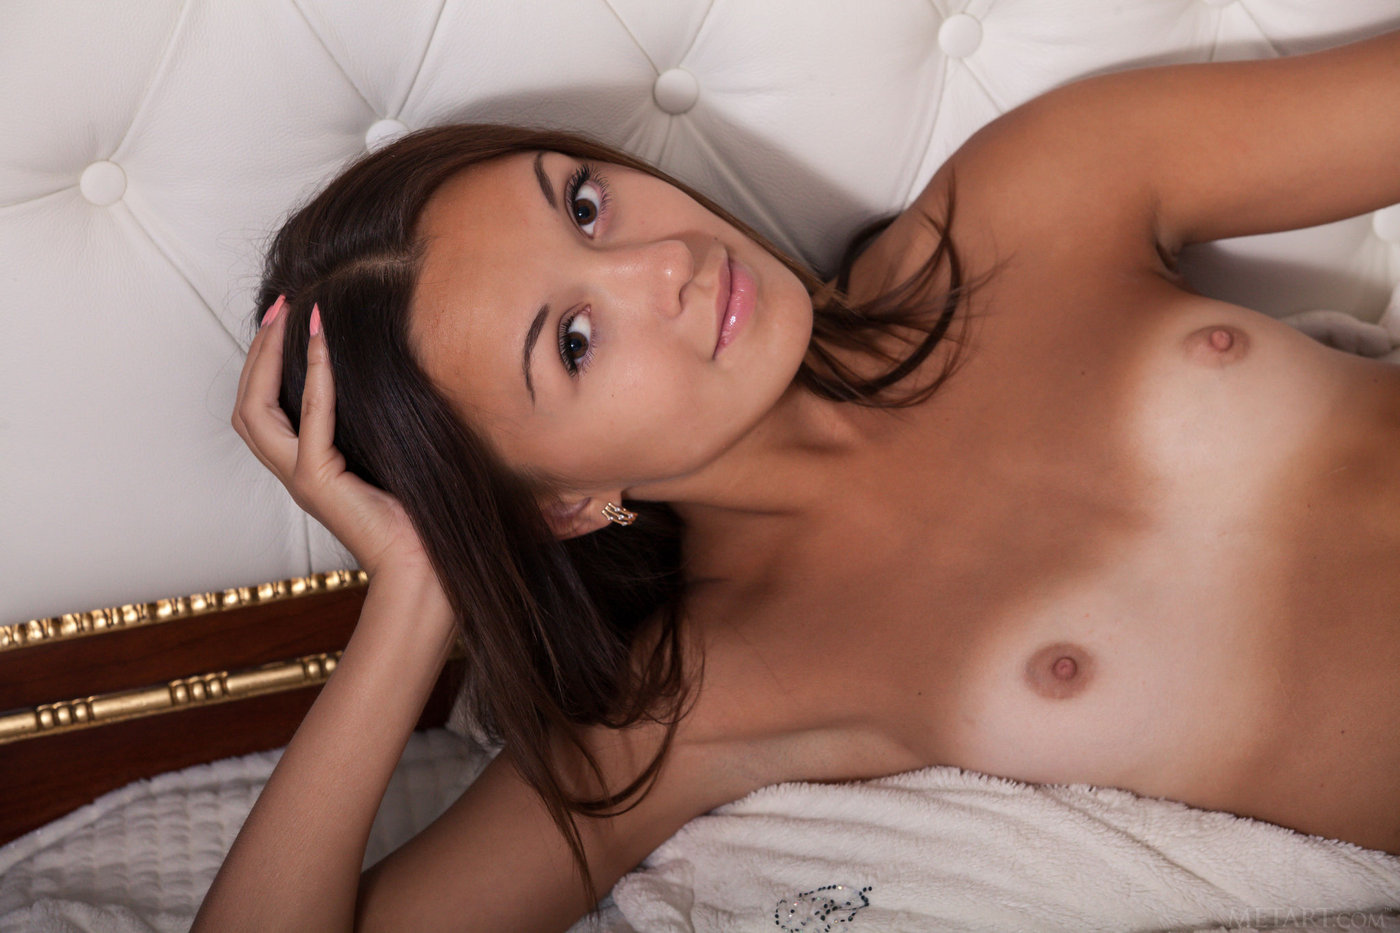 naked-small-tits-malaysian-girl-punk-rock-chics-fucking-naked